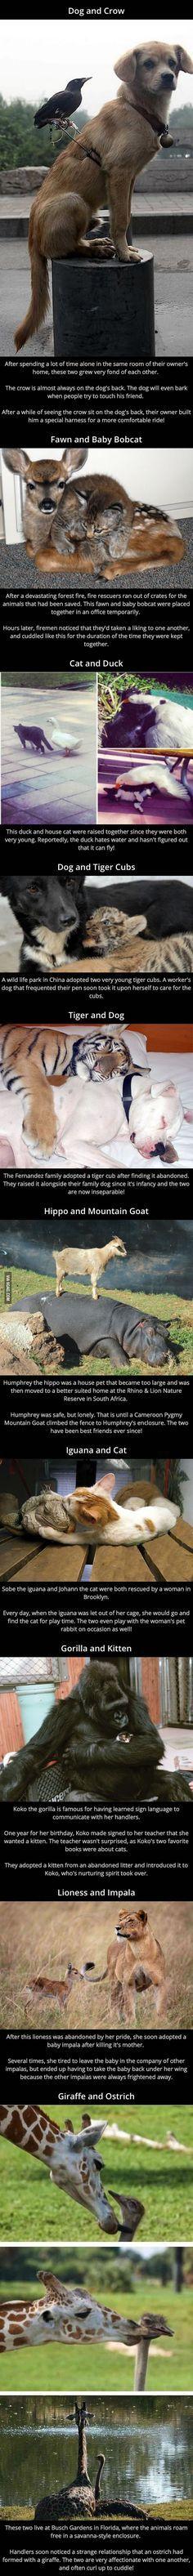 Unusual Animal Friendships - www.viralpx.com